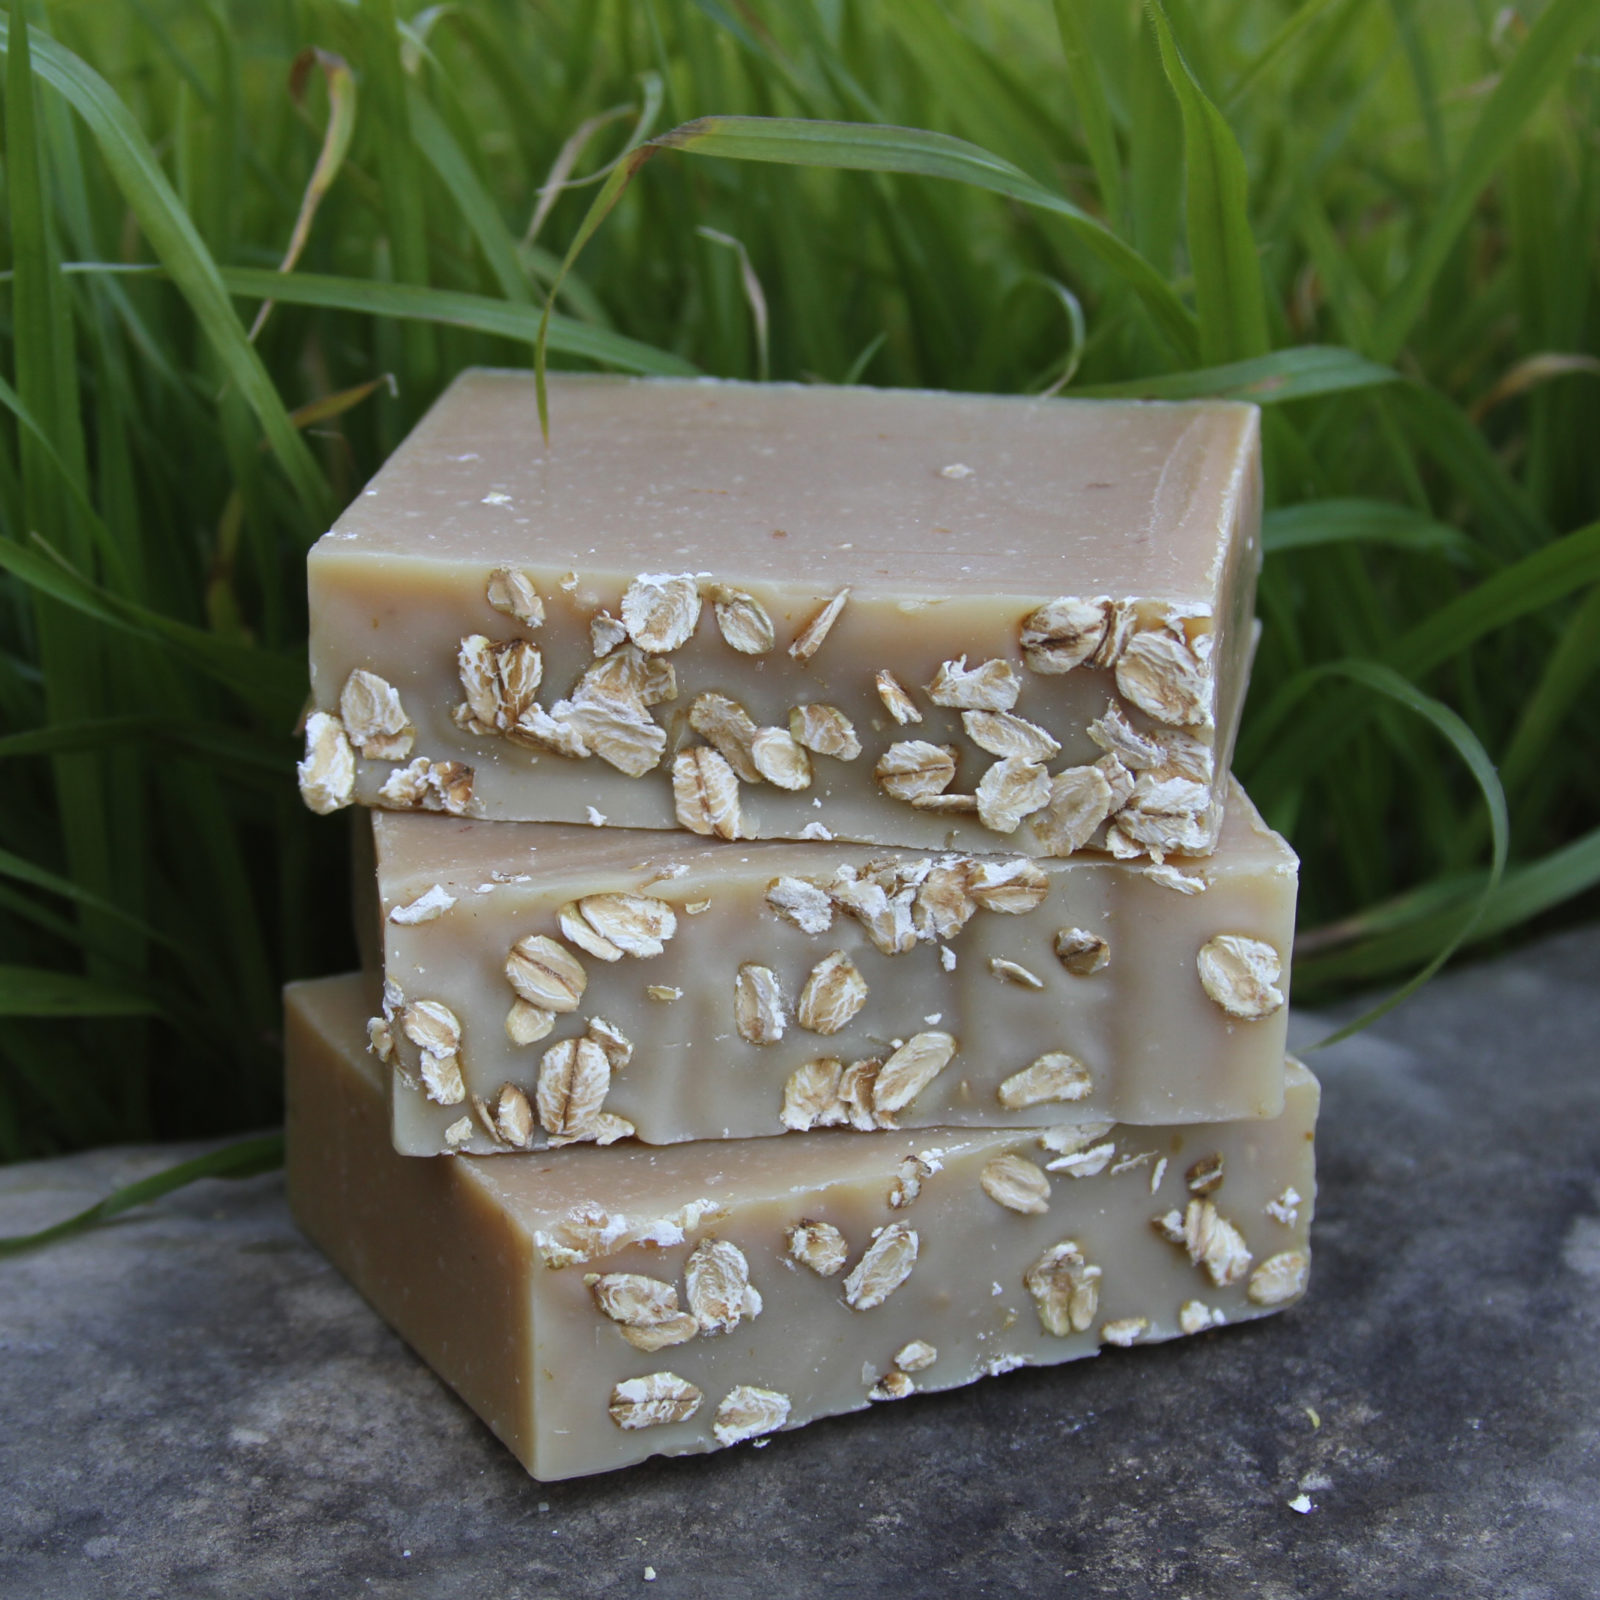 Milk Honey Soap Goats Milk by Old Factory Soap Best Soap for Kids